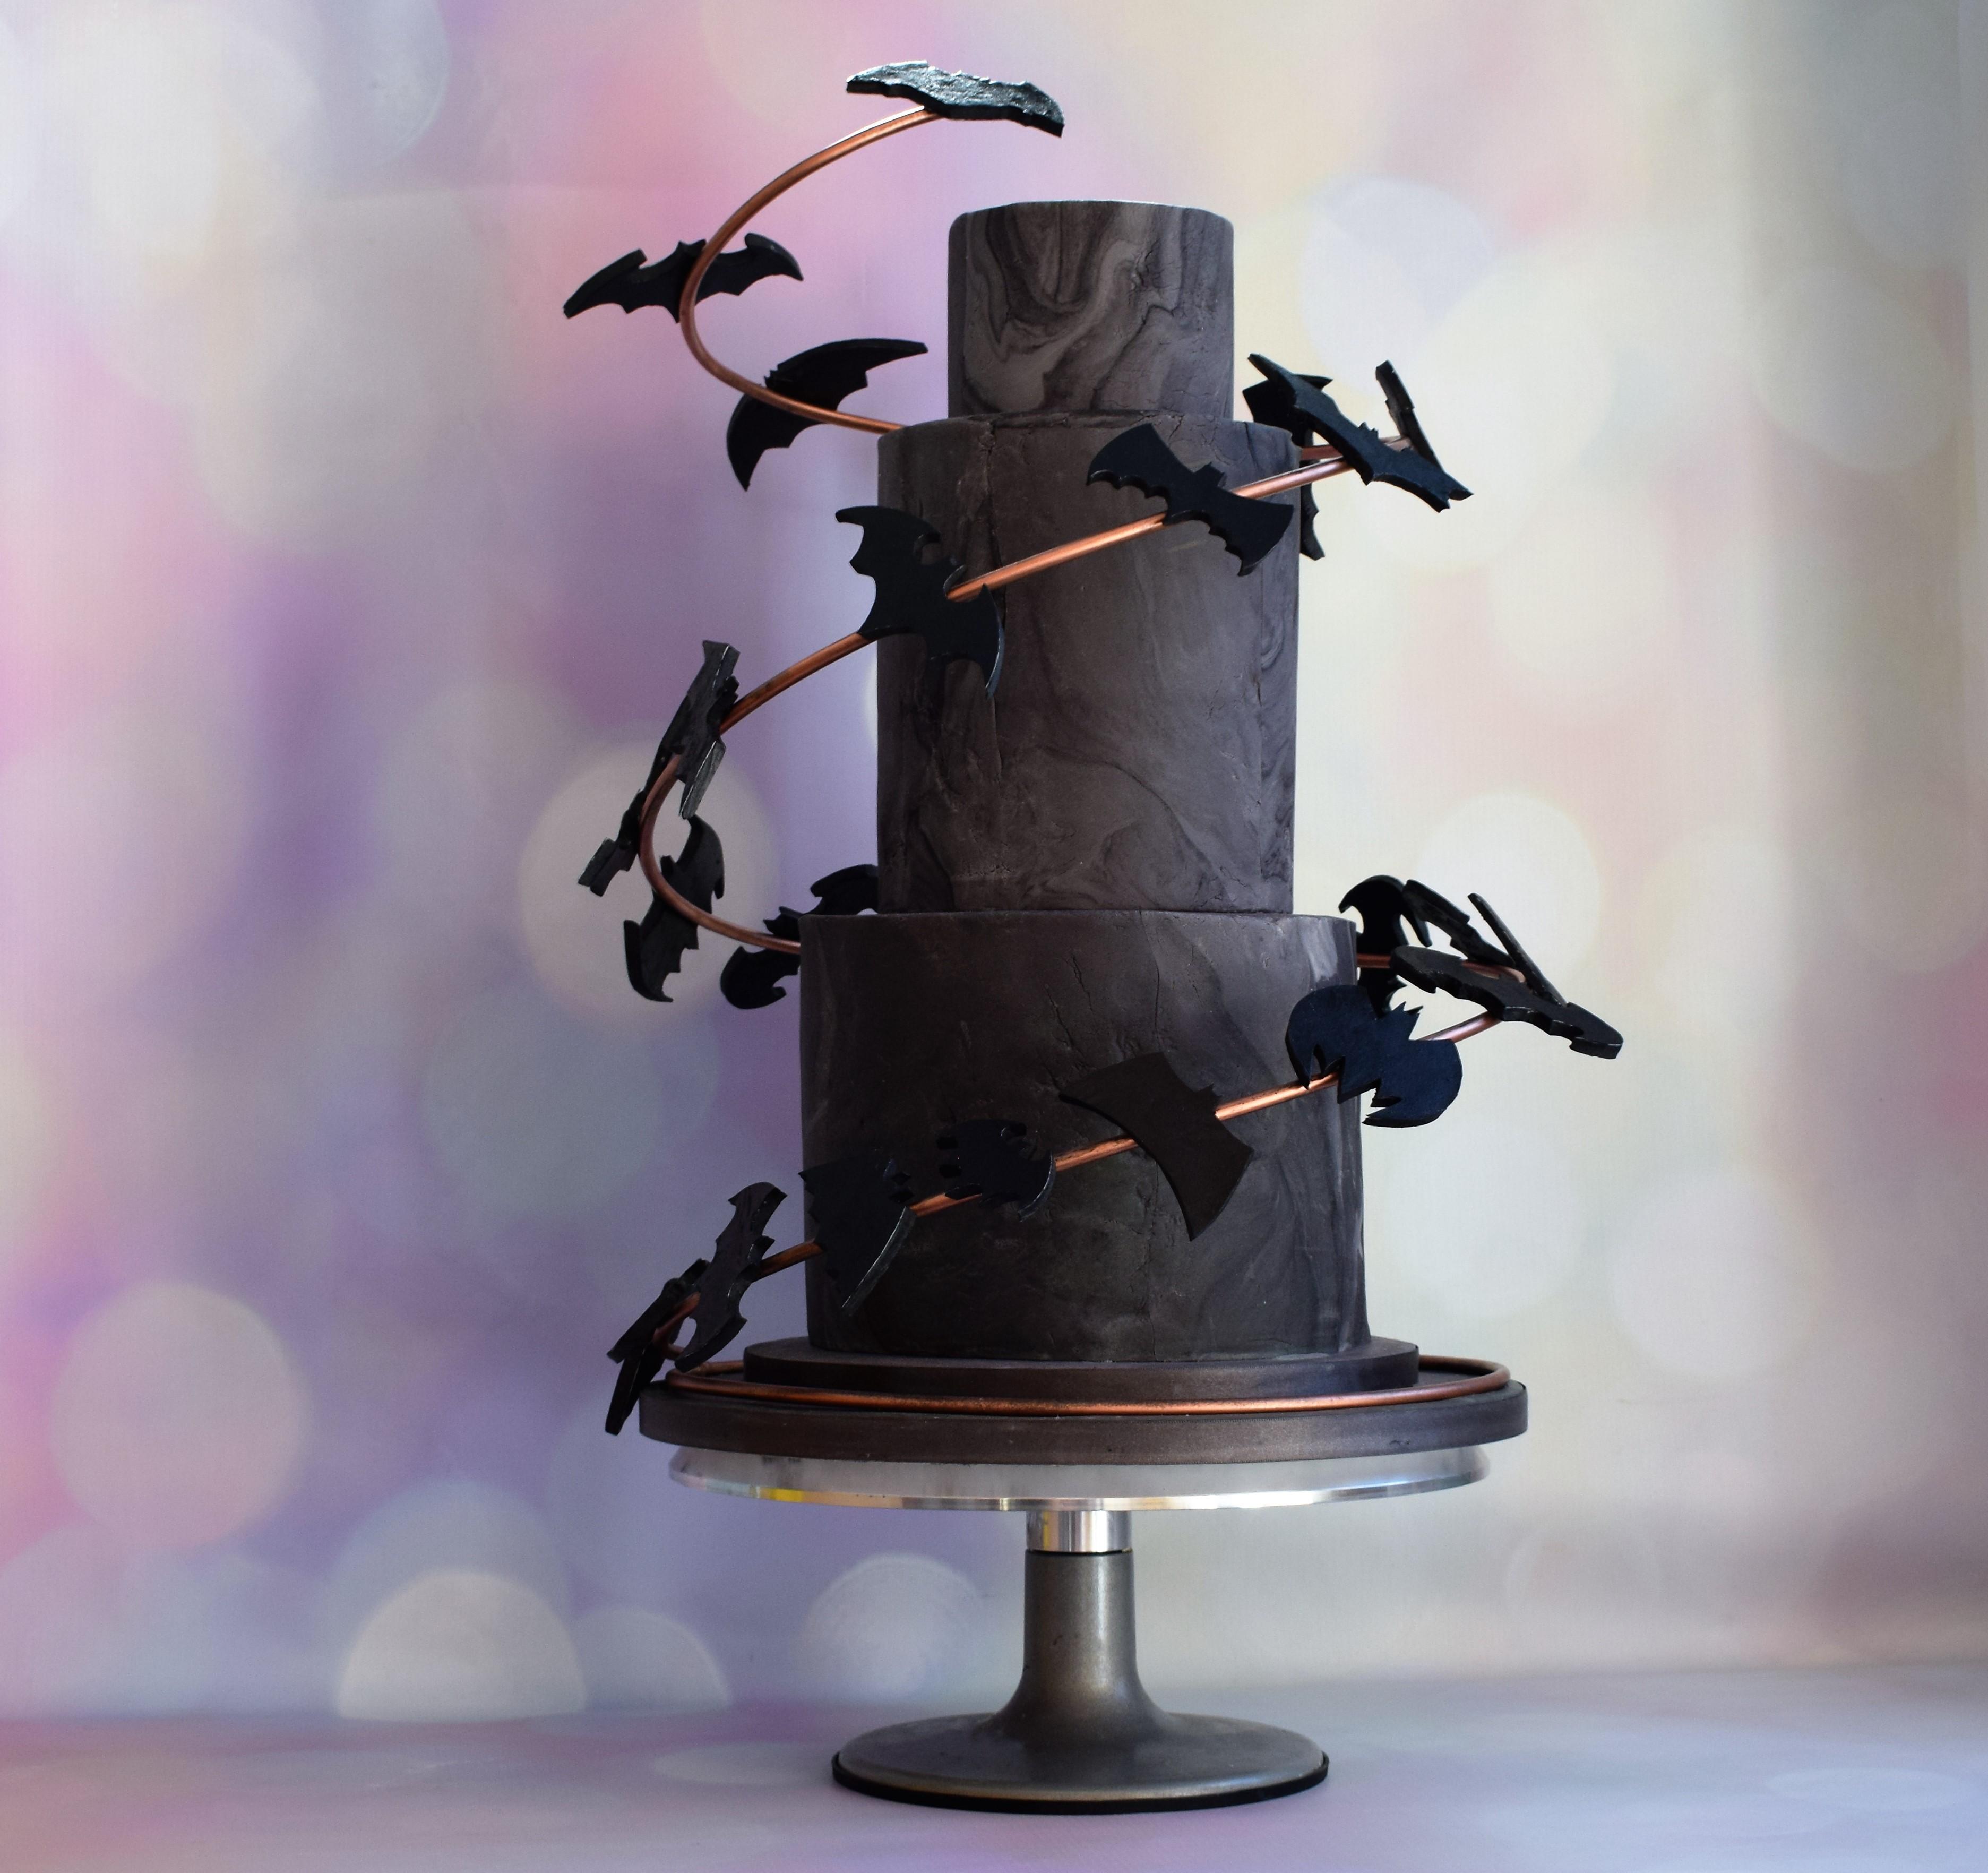 bake to the future - marvel wedding cake - batman wedding cake - alternative wedding cake